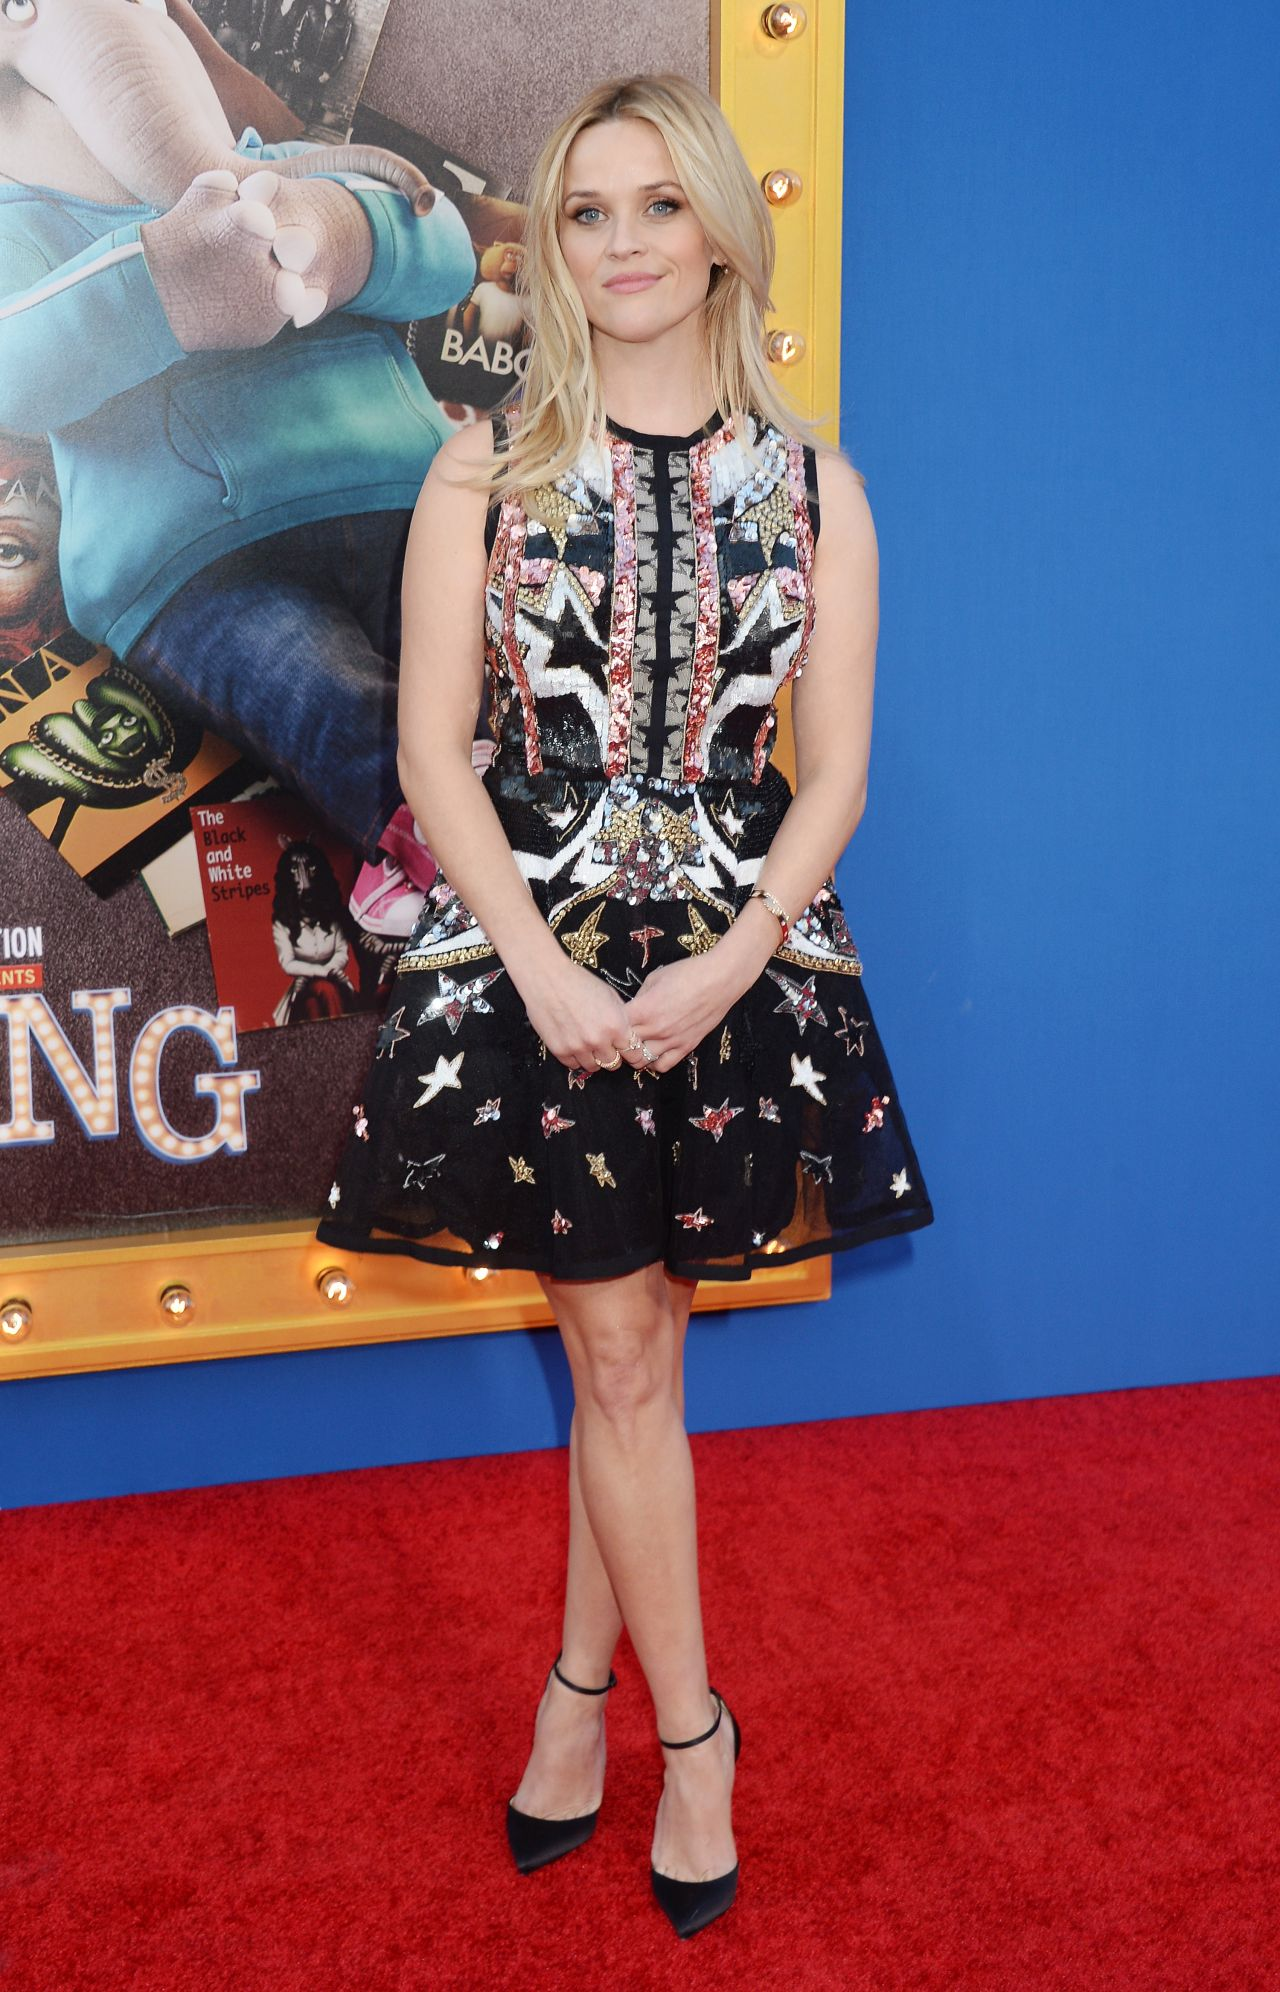 Reese Witherspoon Sing Movie Premiere In Los Angeles